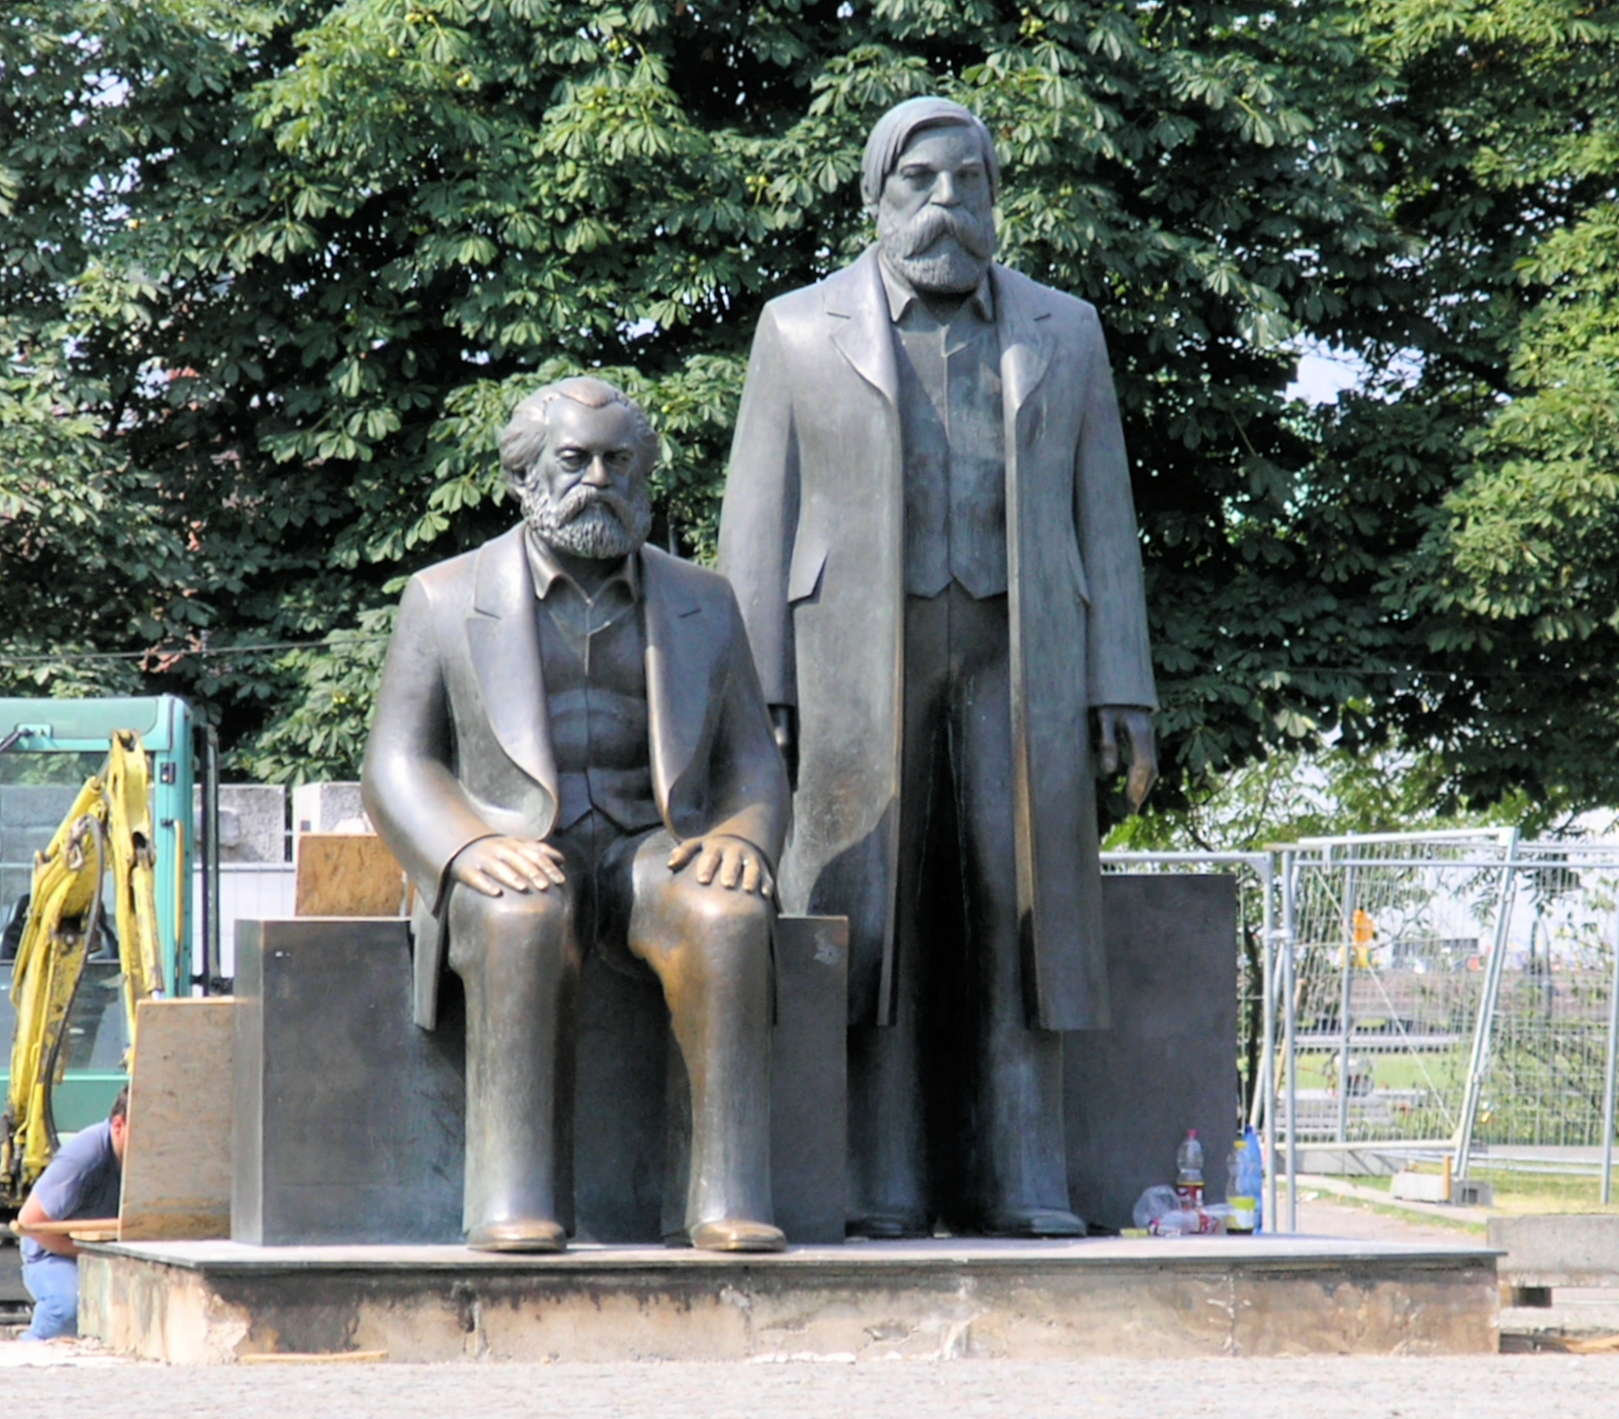 https://upload.wikimedia.org/wikipedia/commons/f/f9/Denkmal_Karl-Liebknecht-Str_(Mitte)_Marx_Engels.jpg